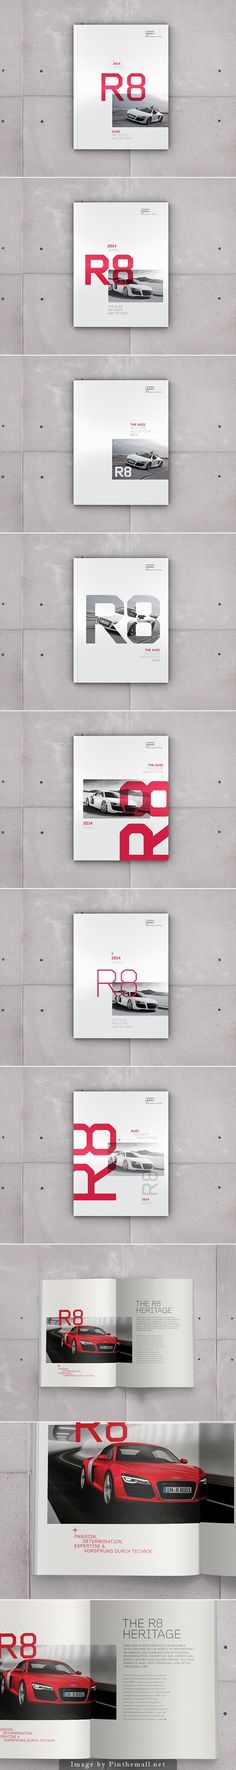 Audi R8 Brochure Editorial Design, Graphic Design, Print Design Project By Jonathan Quintin